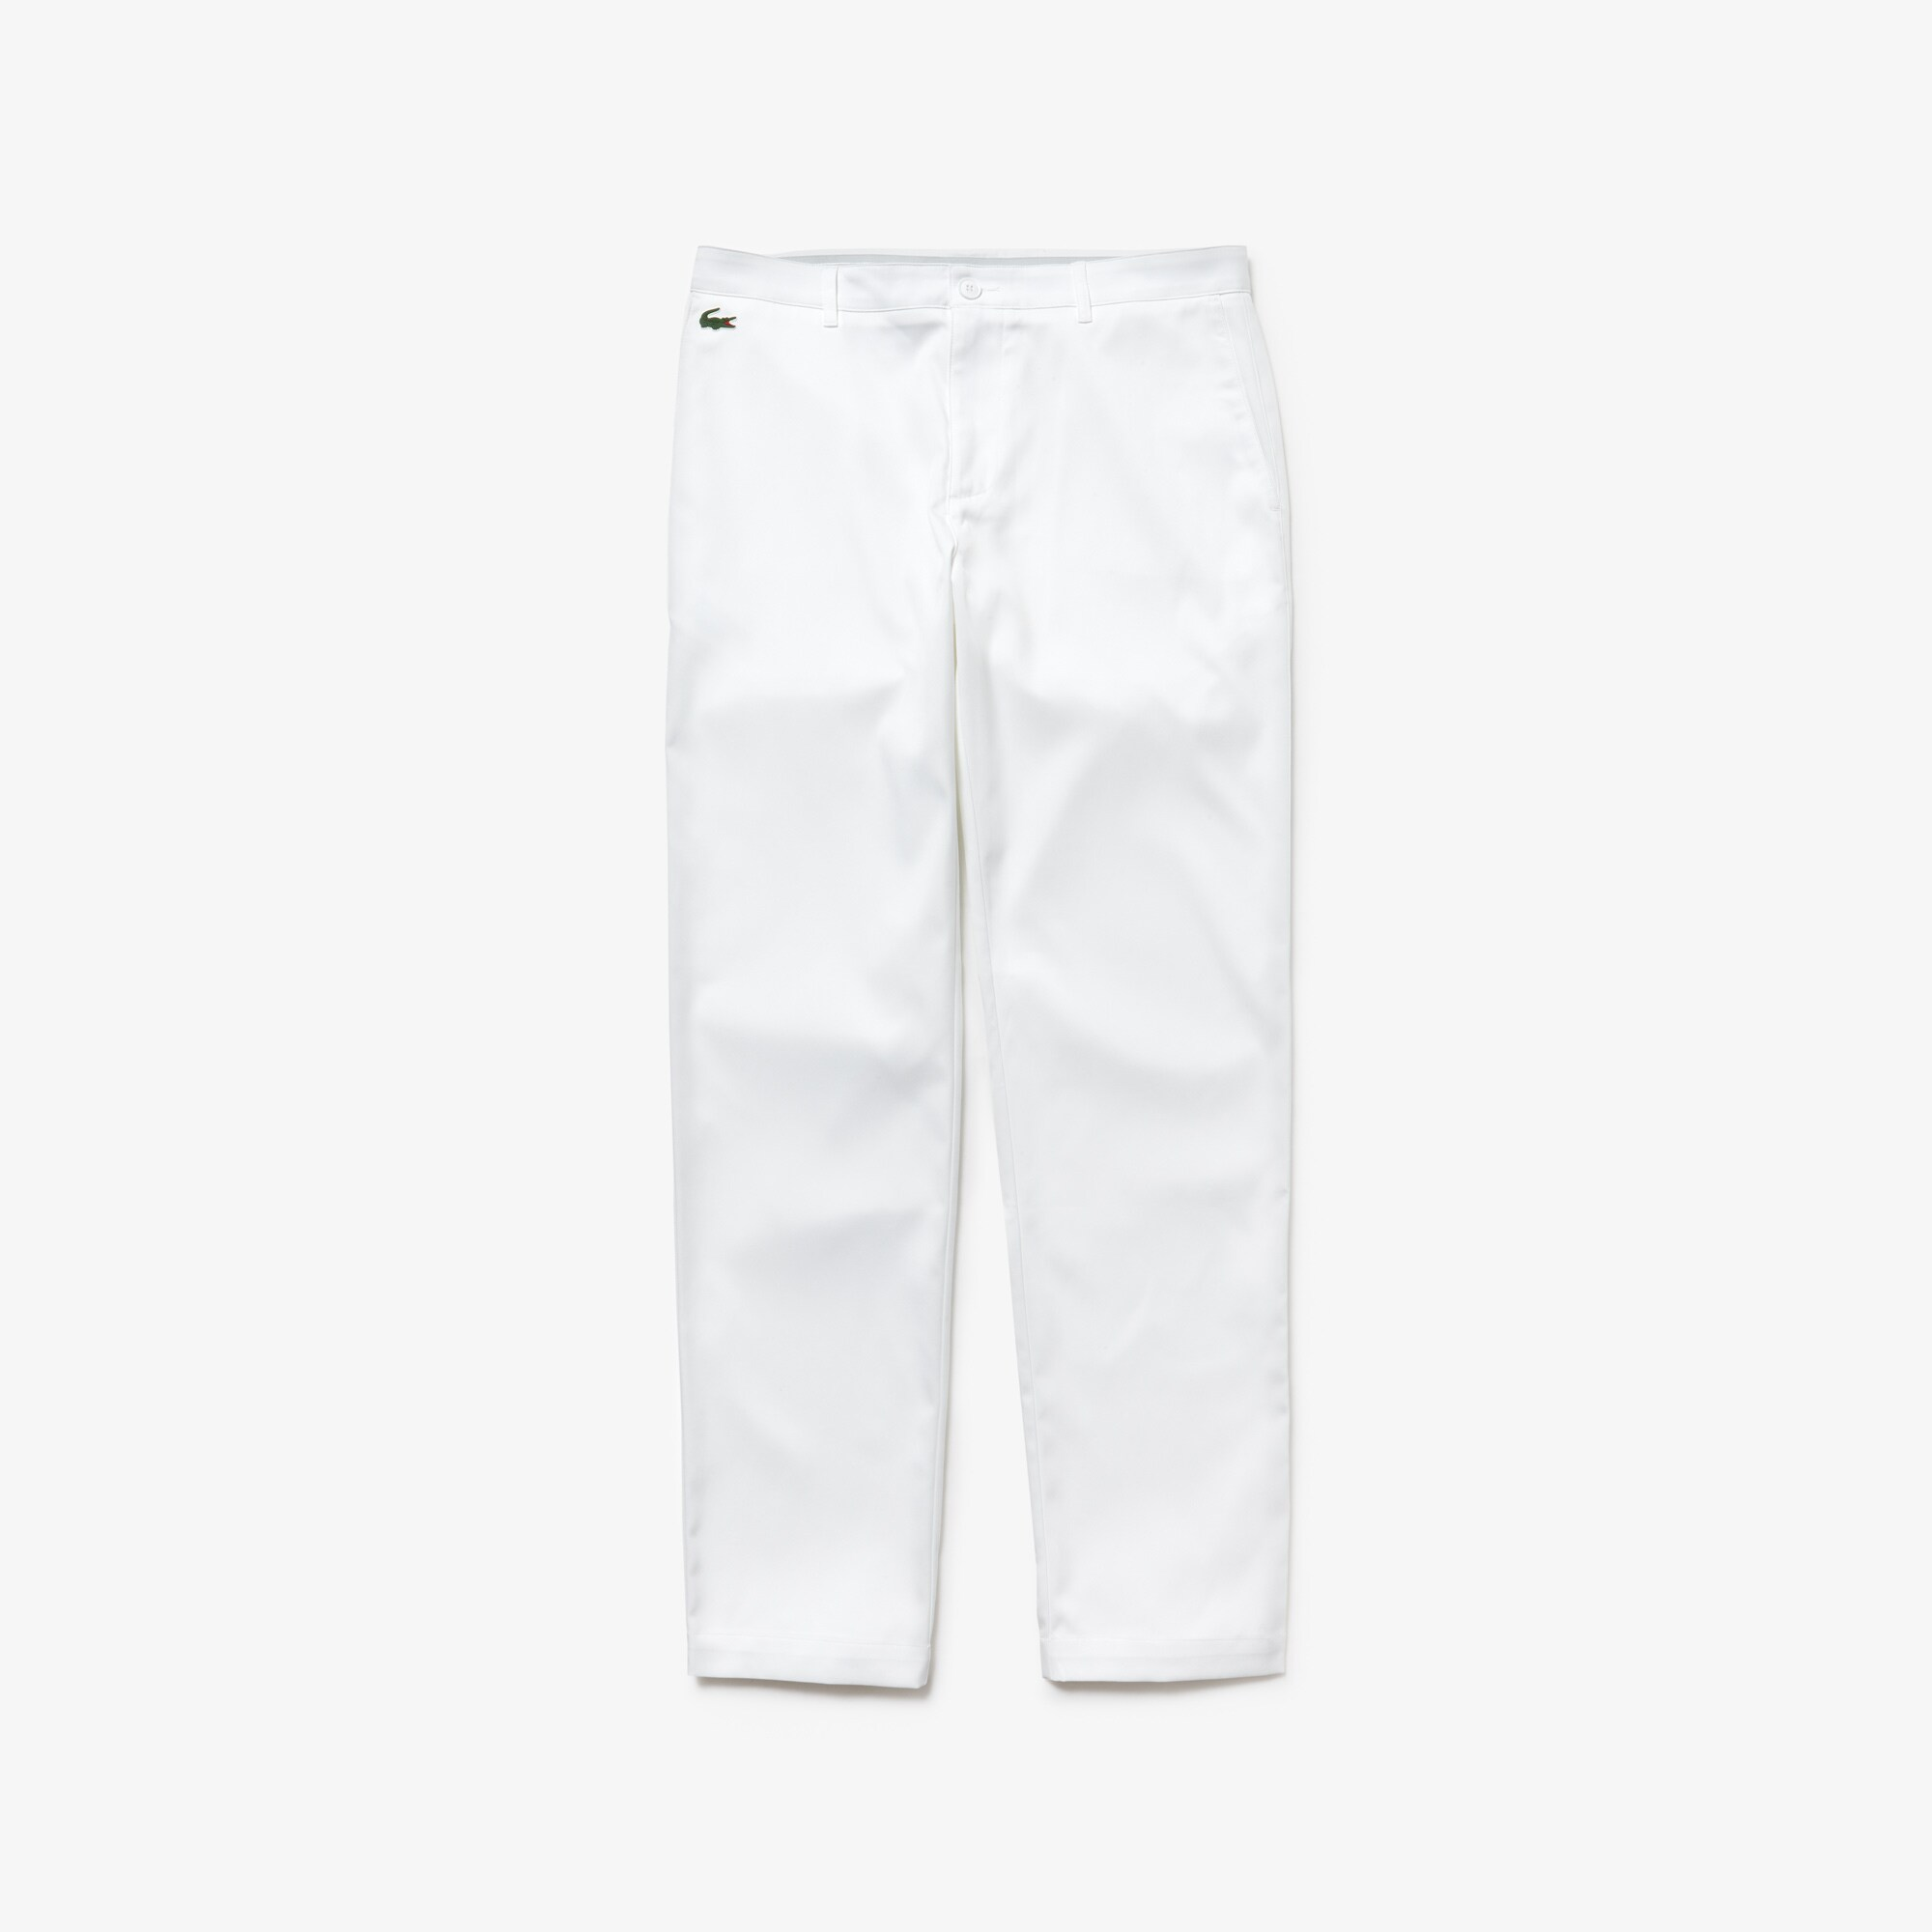 Pantalon chino Golf Lacoste SPORT en gabardine technique unie